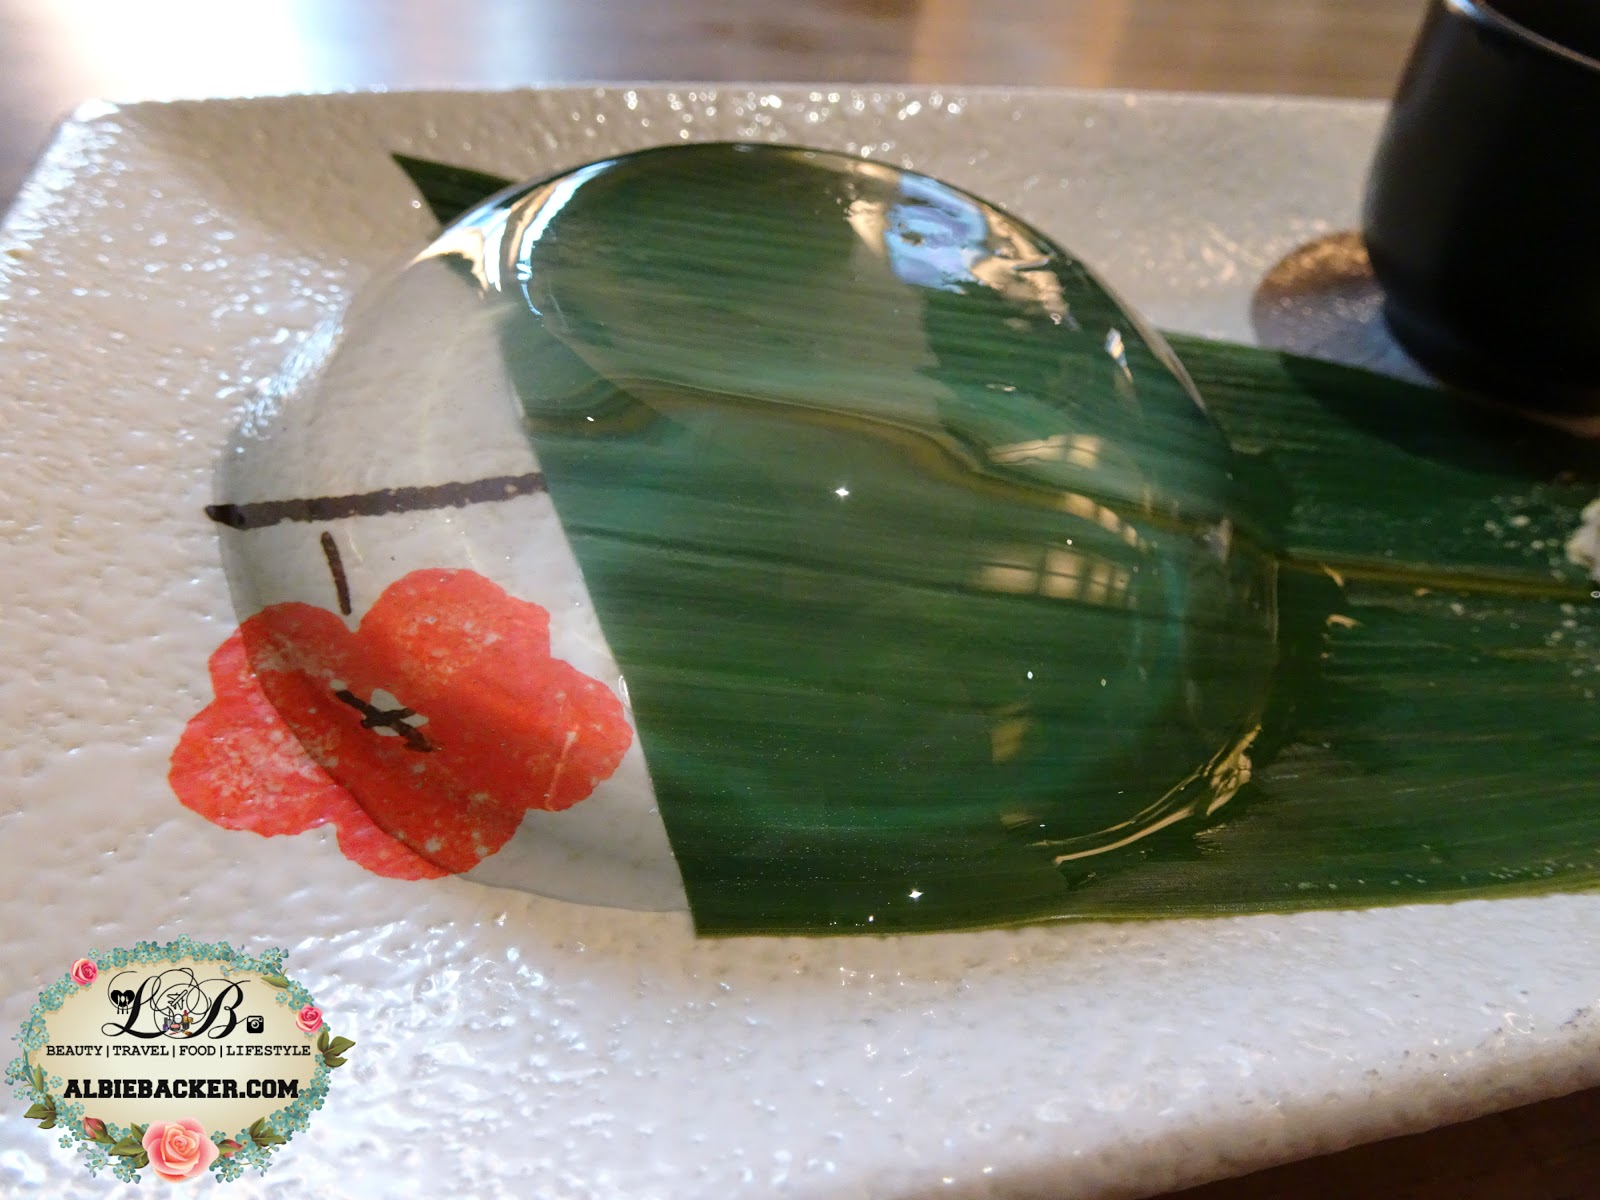 Japanese Bouncy Cake Recipe: Raindrop Cake Or Water Cake